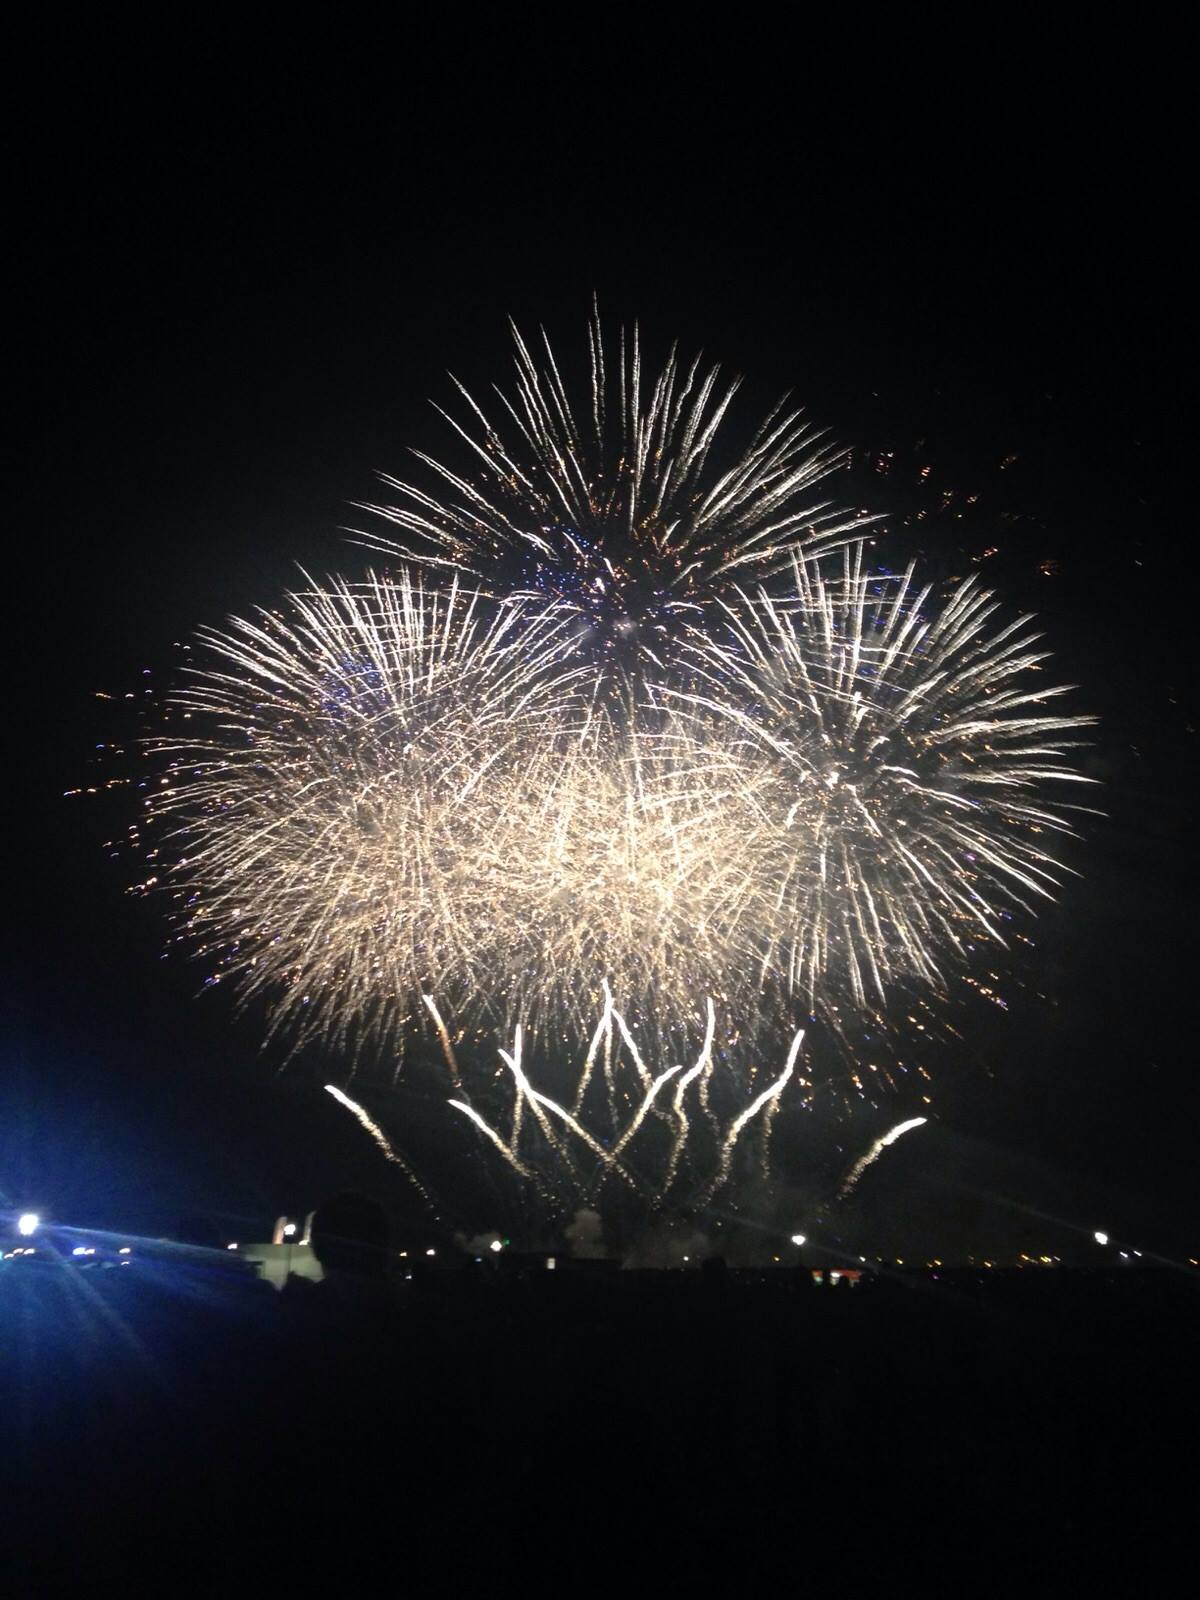 Blackheath Fireworks South London Club